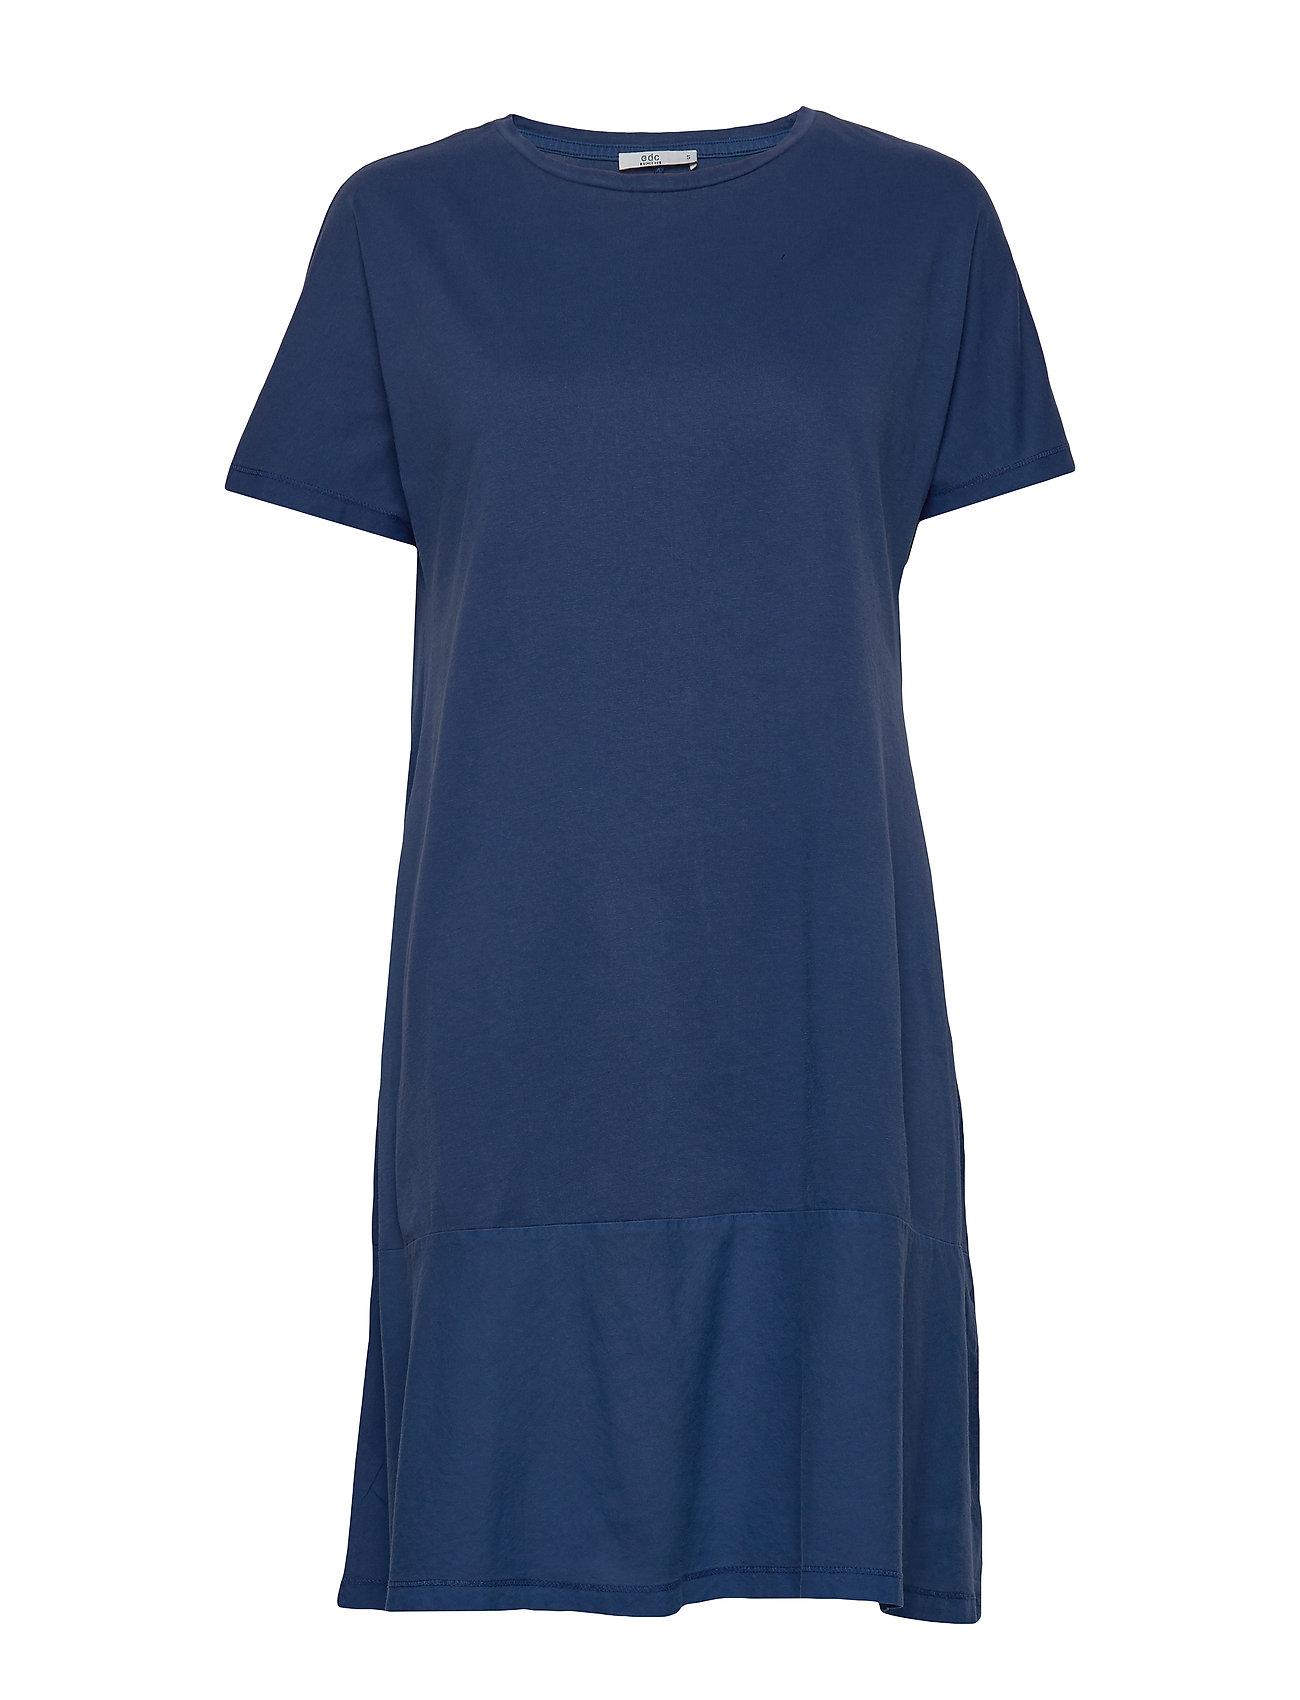 Image of Dresses Knitted Kort Kjole Blå EDC By Esprit (3360909191)